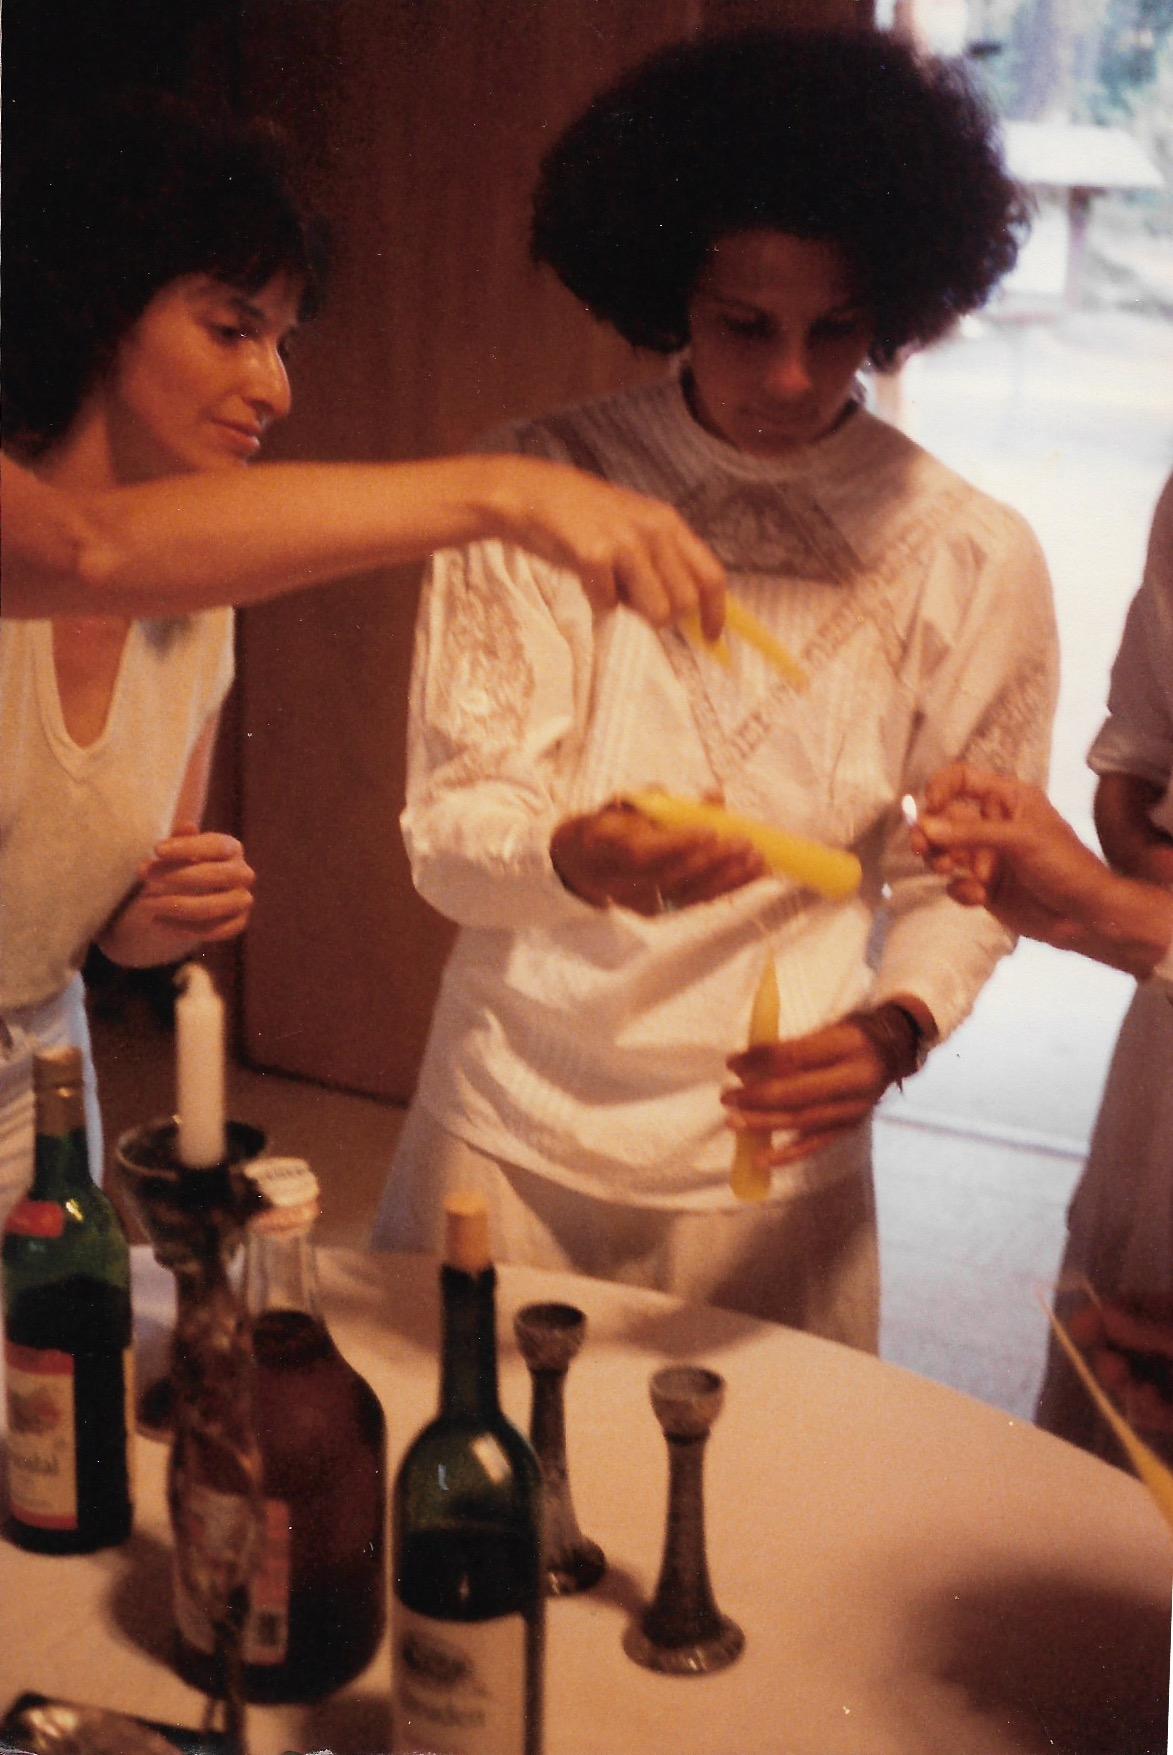 87 Joys  Preparing Shabbat candles, Linda Elyad, Carol Goodman Sills copy.jpeg